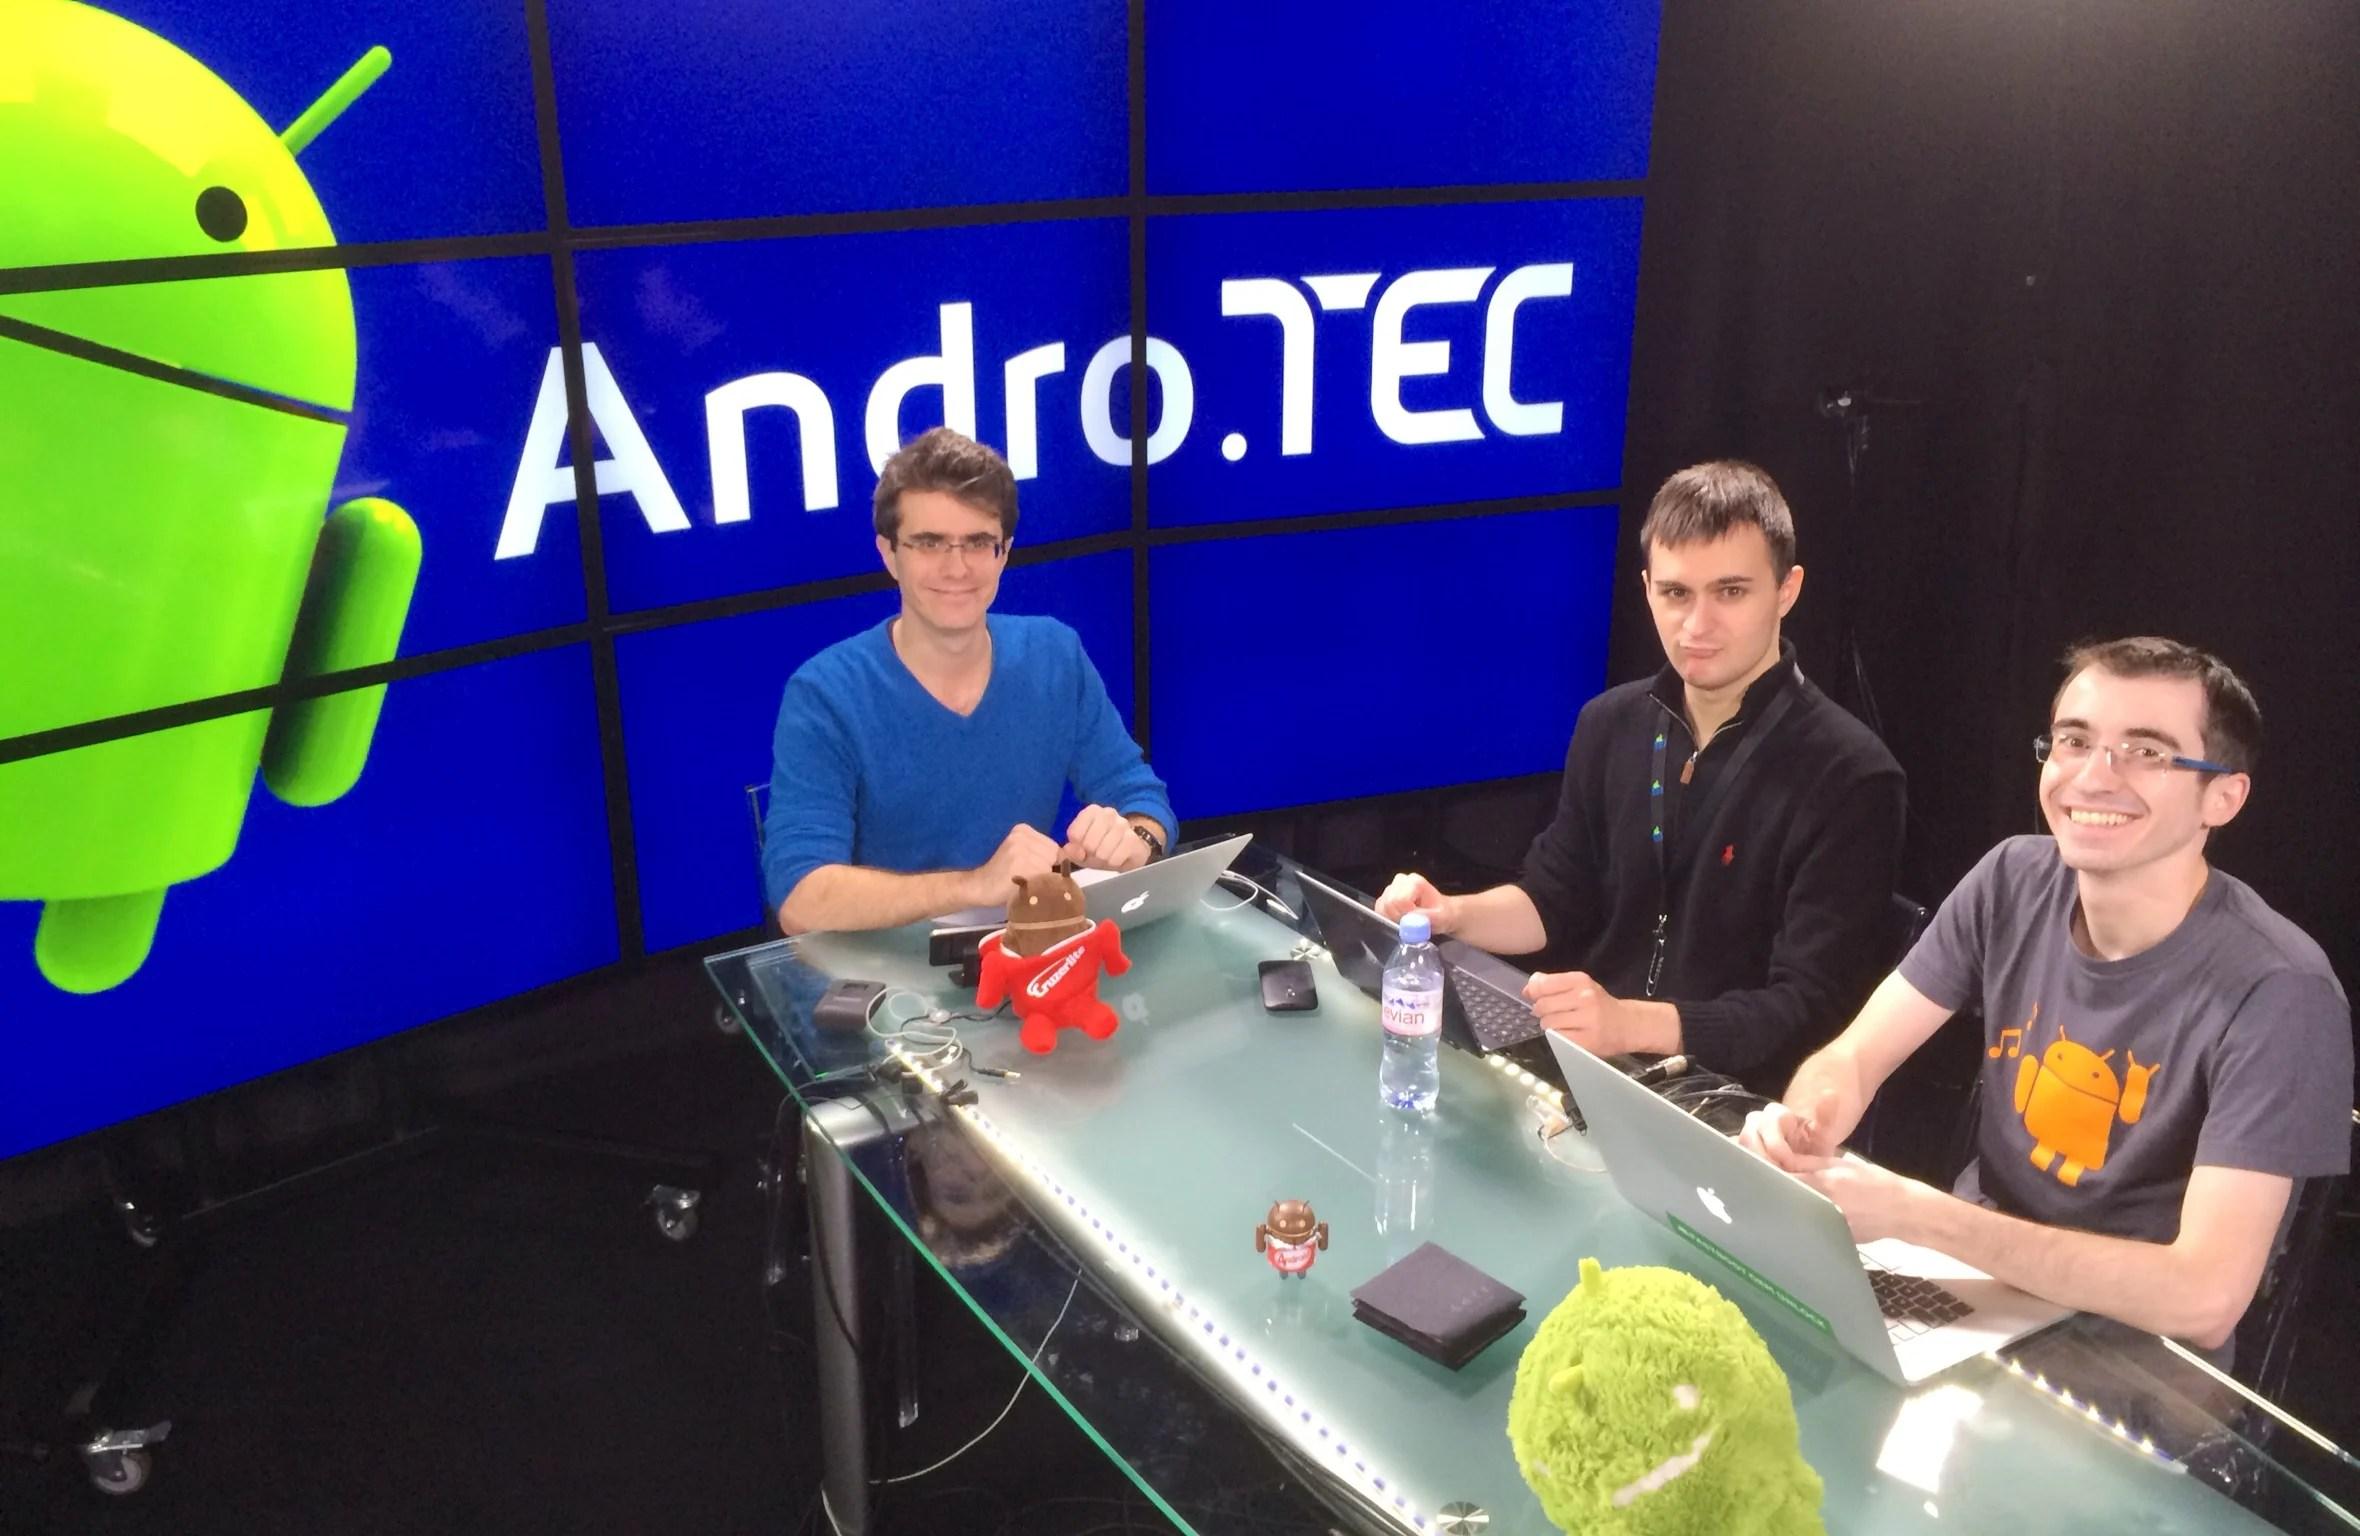 AndroTEC 006 : regardez l'enregistrement en live et posez vos questions !